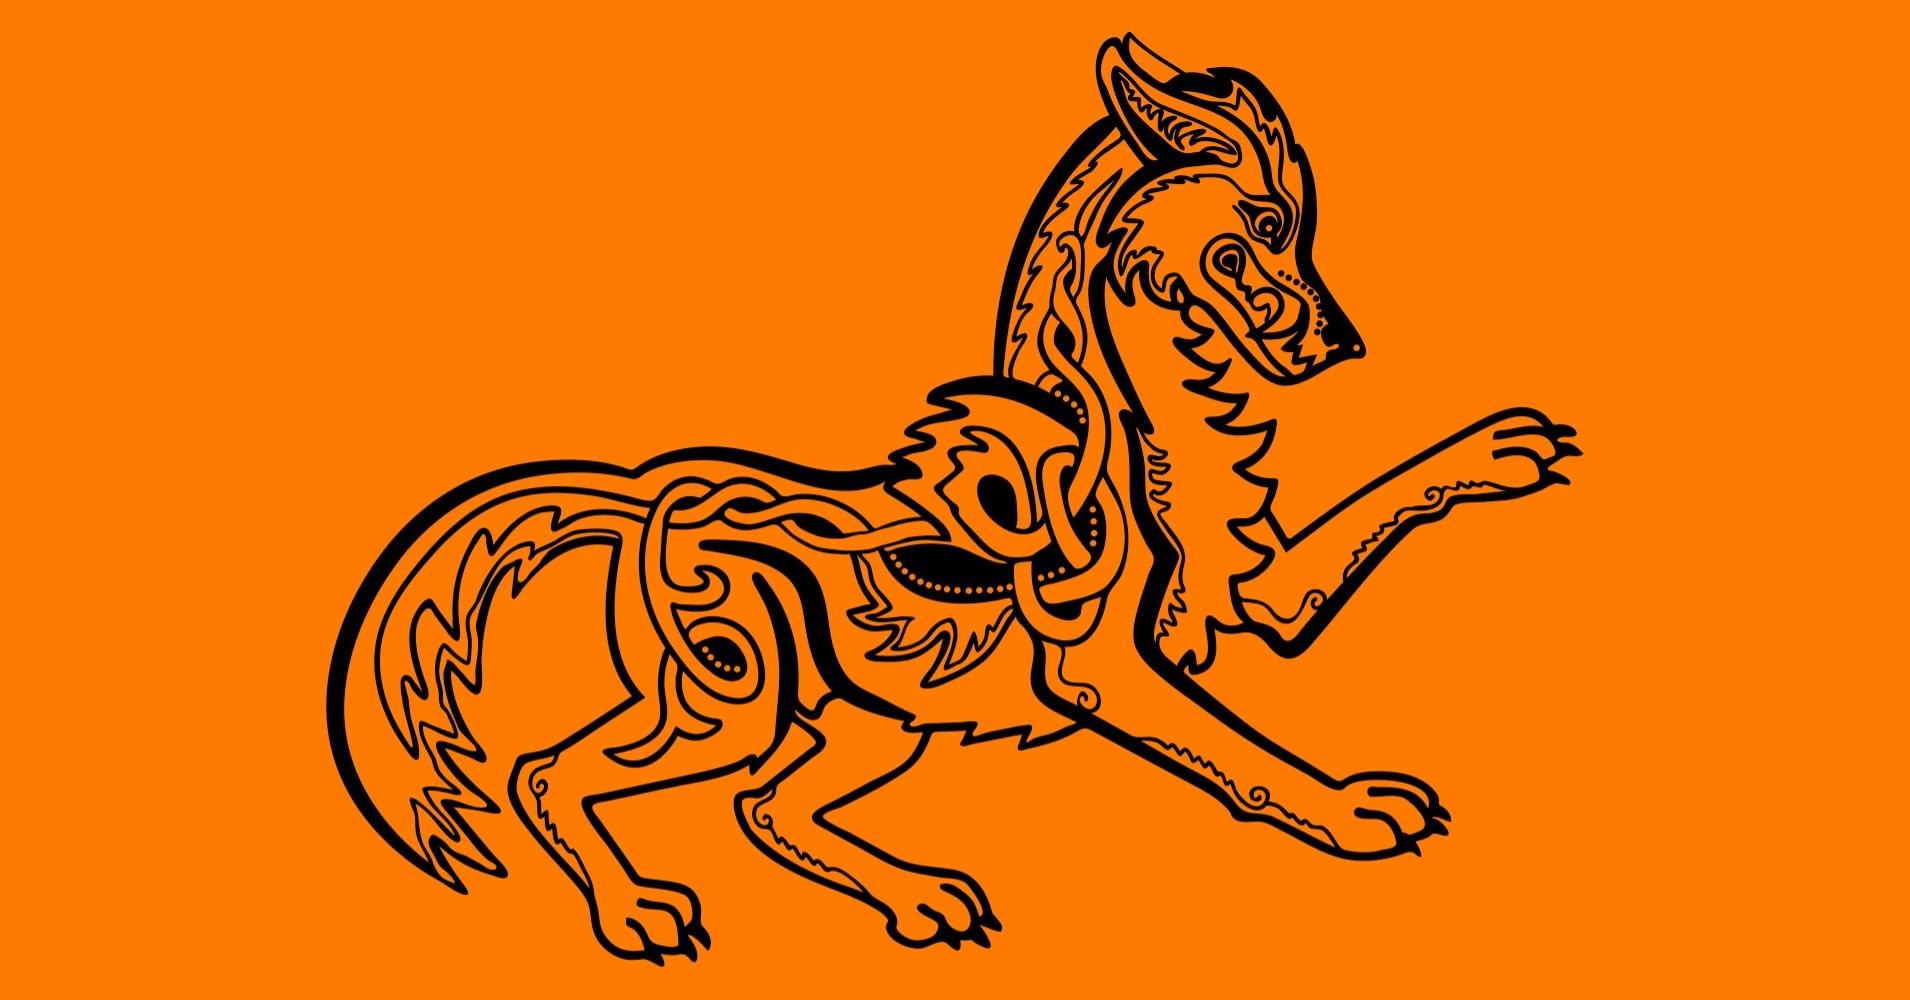 Norse Mythology Creatures Question 1